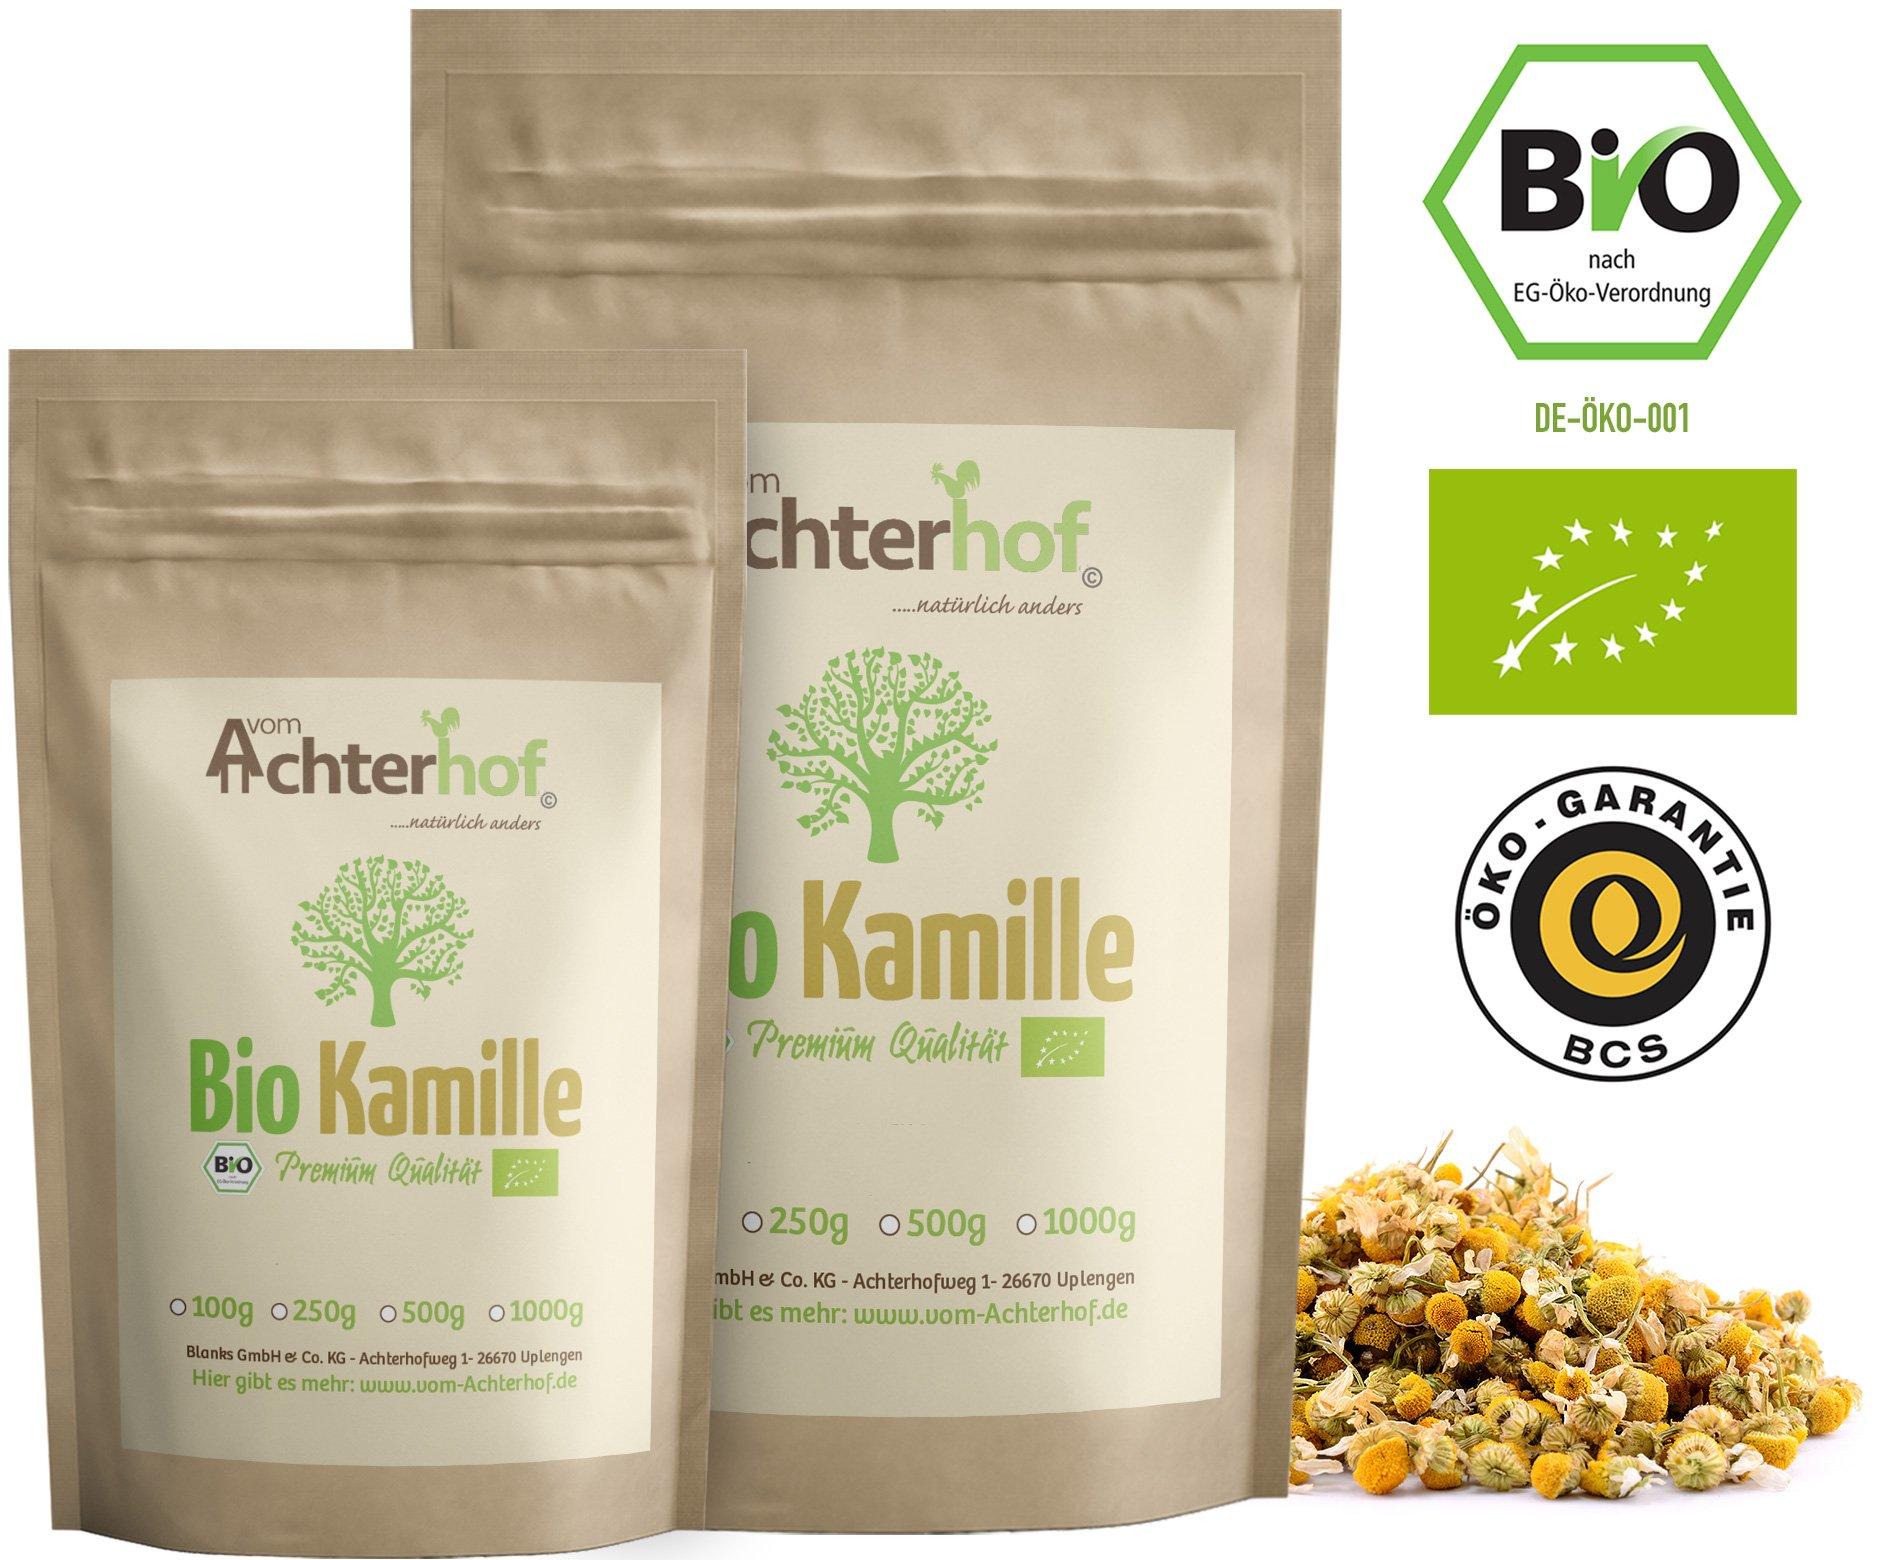 Kamillentee-Bio-lose-500g-Kamillenblten-Tee-getrocknet-Kamille